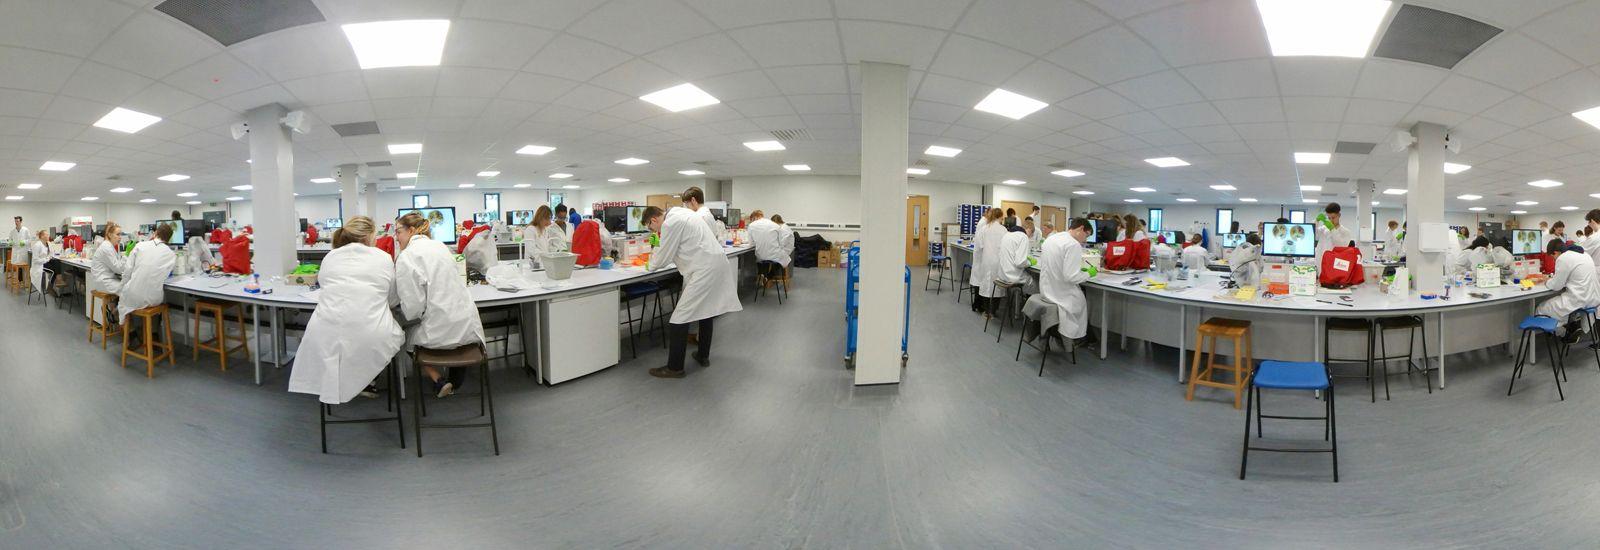 Biological Sciences lab